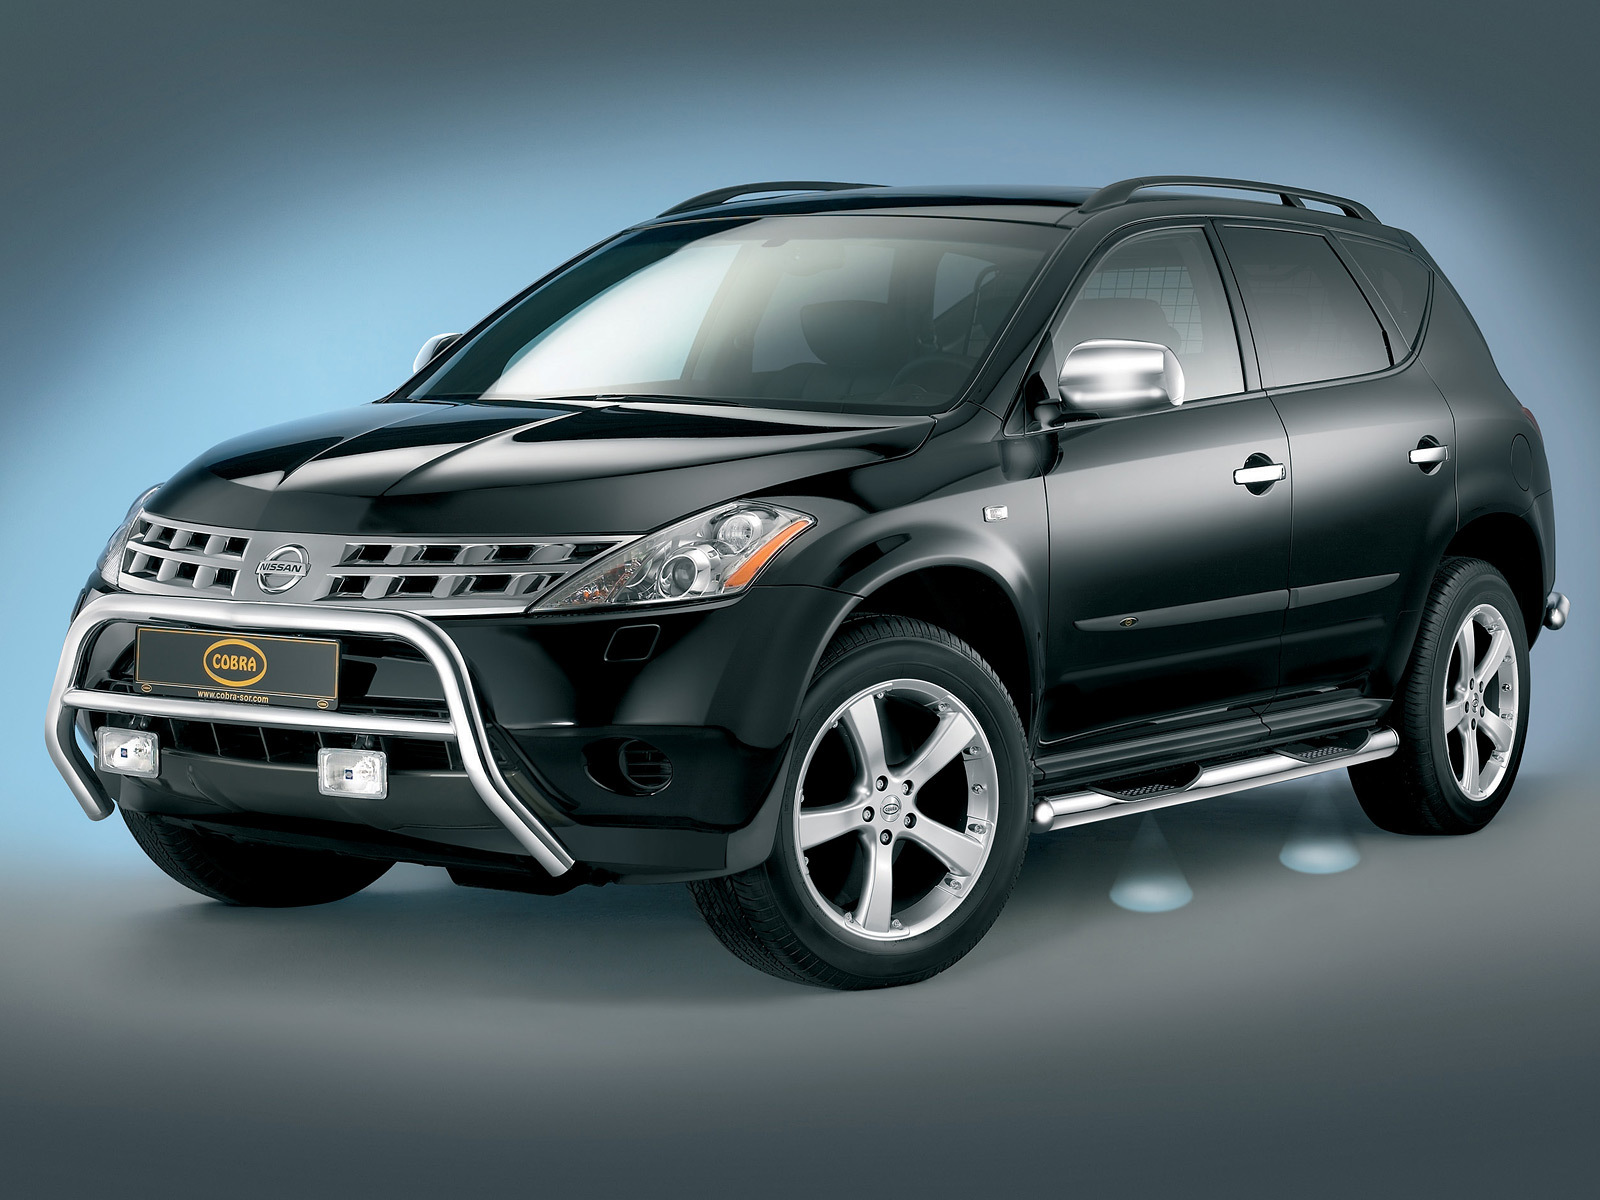 Desktop Wallpaper Nissan Murano h691340 Cars HD Images 1600x1200